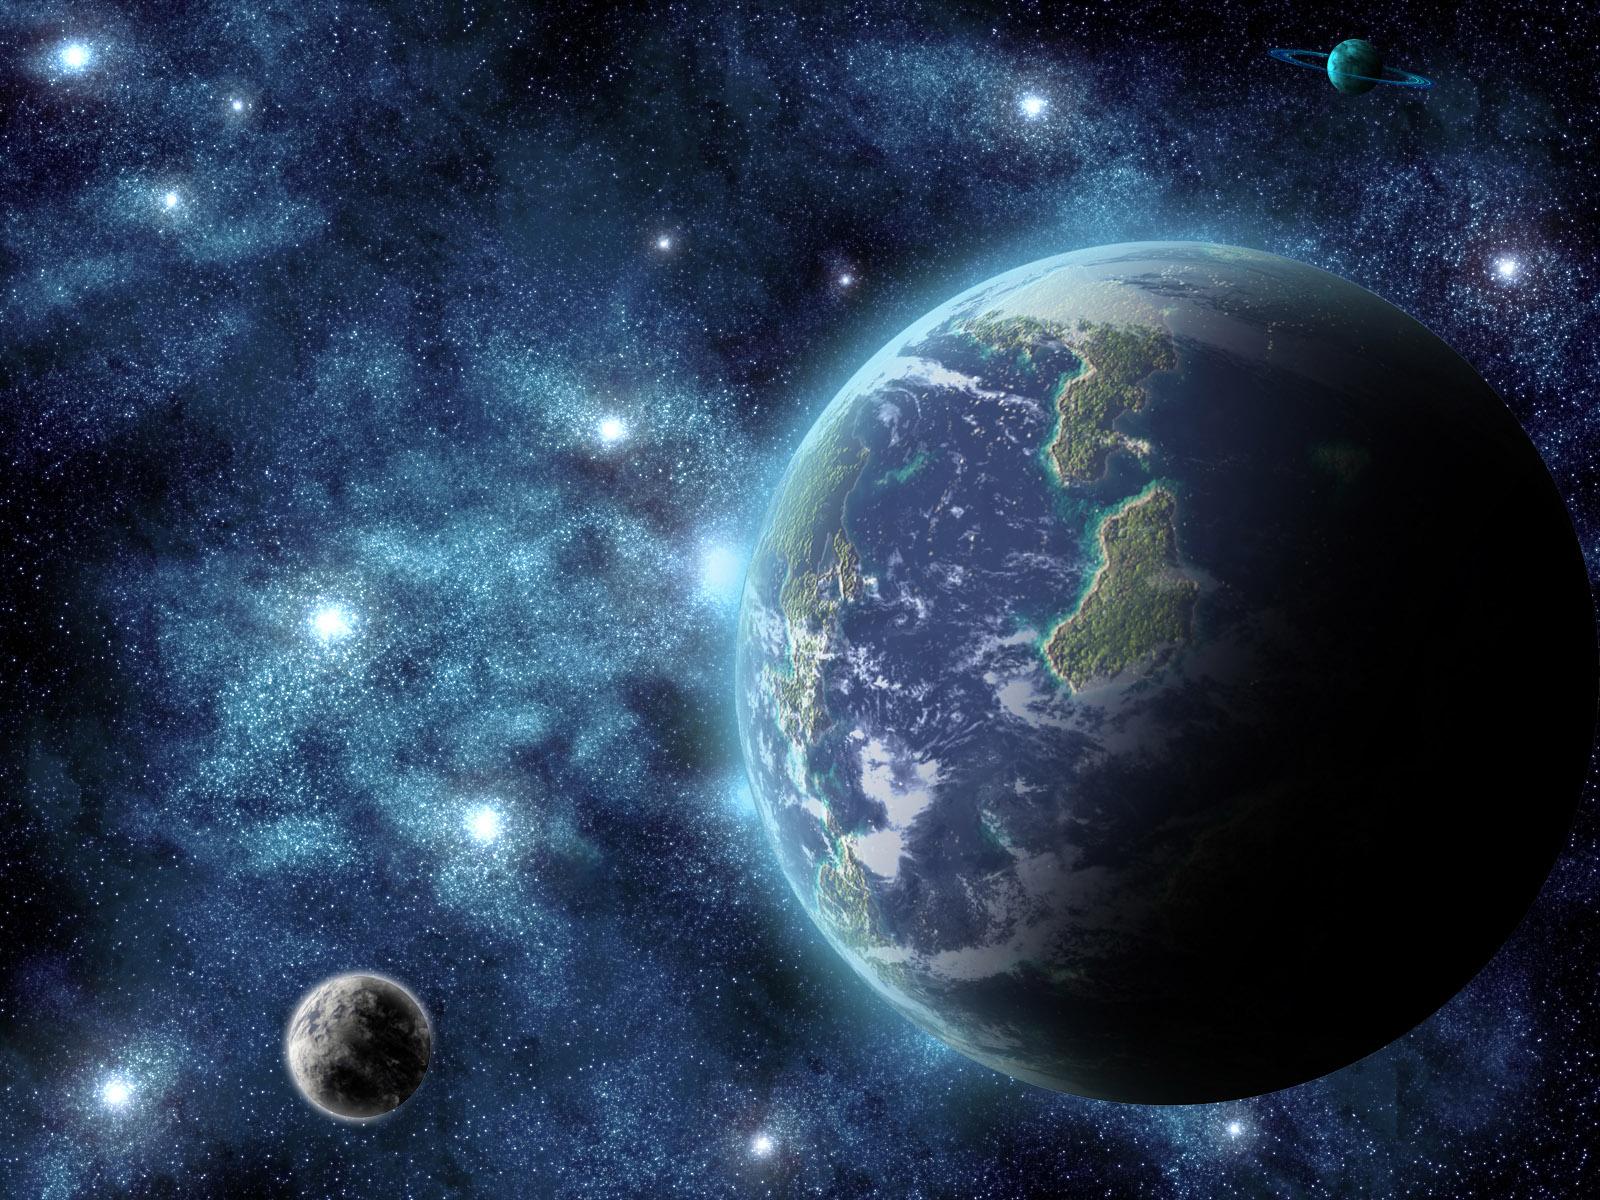 Digital Universe 178   Space Photography Desktop Wallpapers 3695 1600x1200